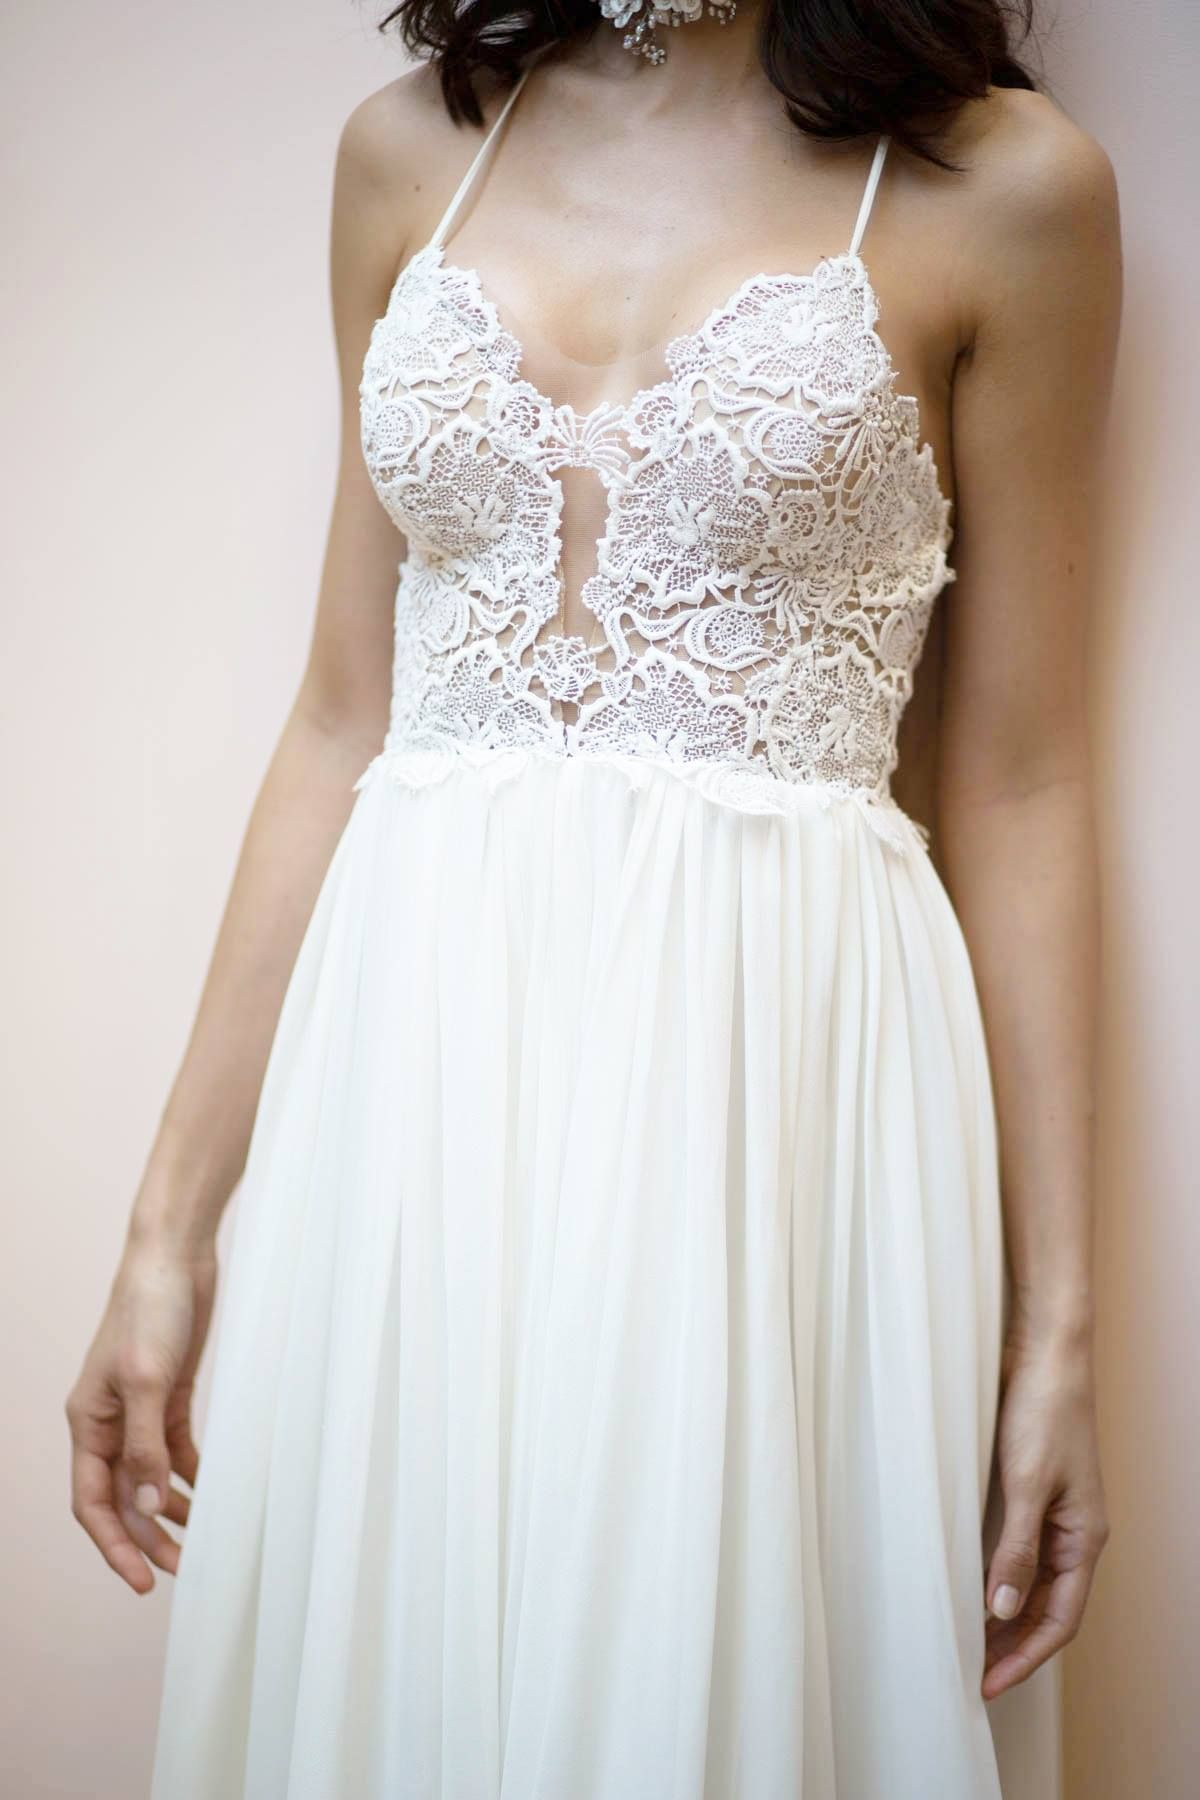 Lace wedding dress low back  Sarah Seven theromanticscollection Whitman Gown romantic lace